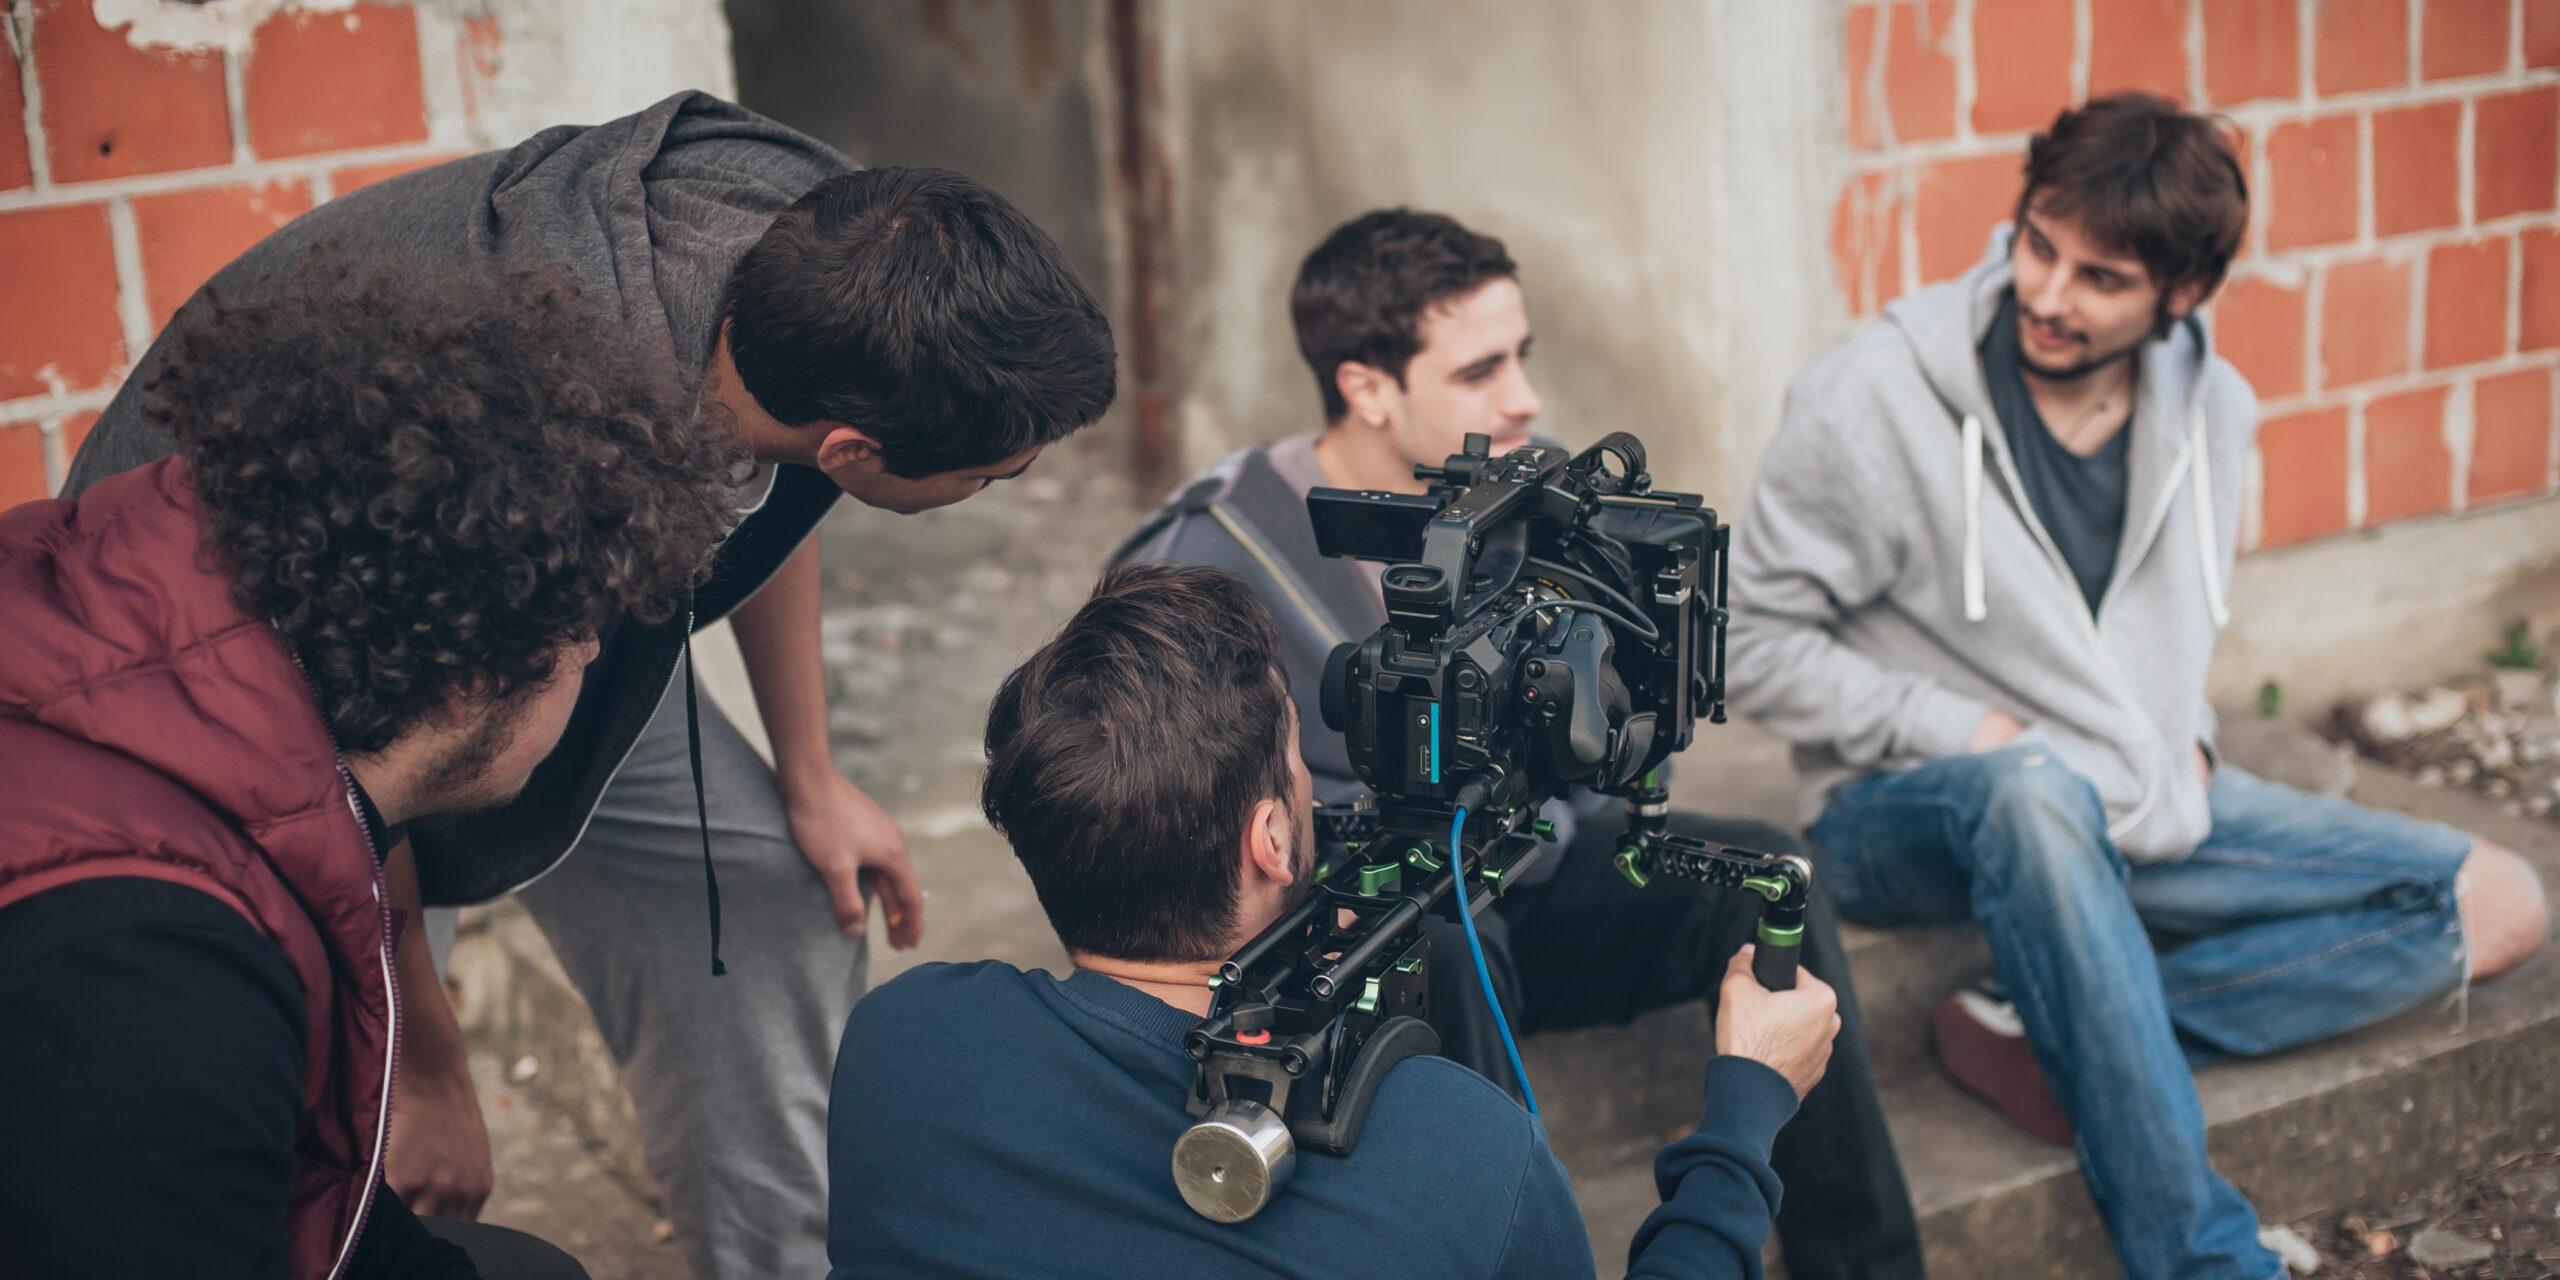 videographer recording actors